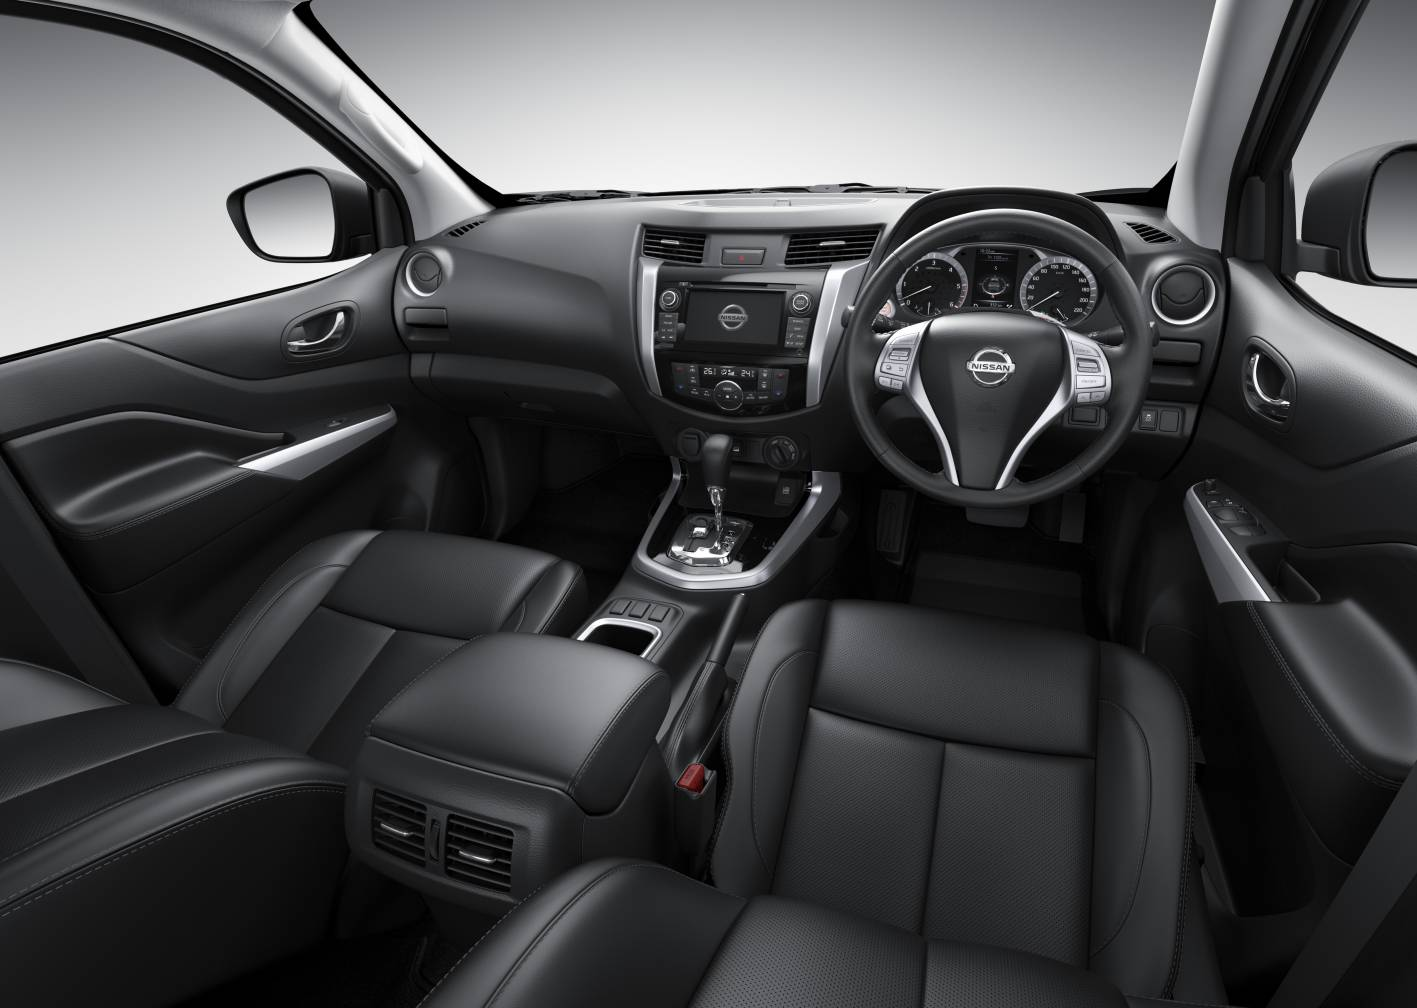 2015 Nissan Navara-interior |